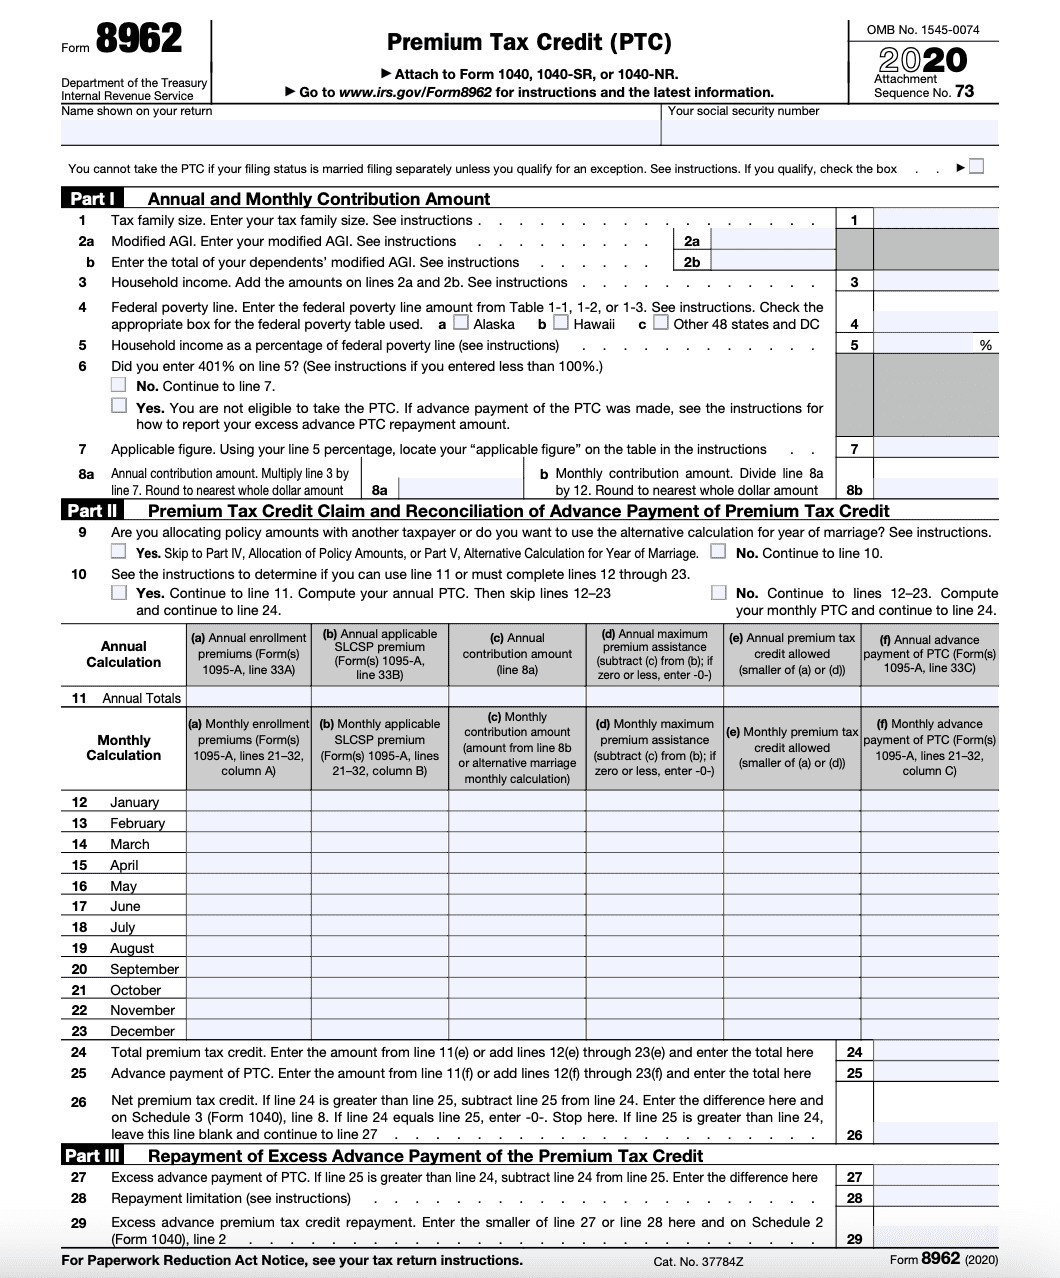 IRS Form 8962